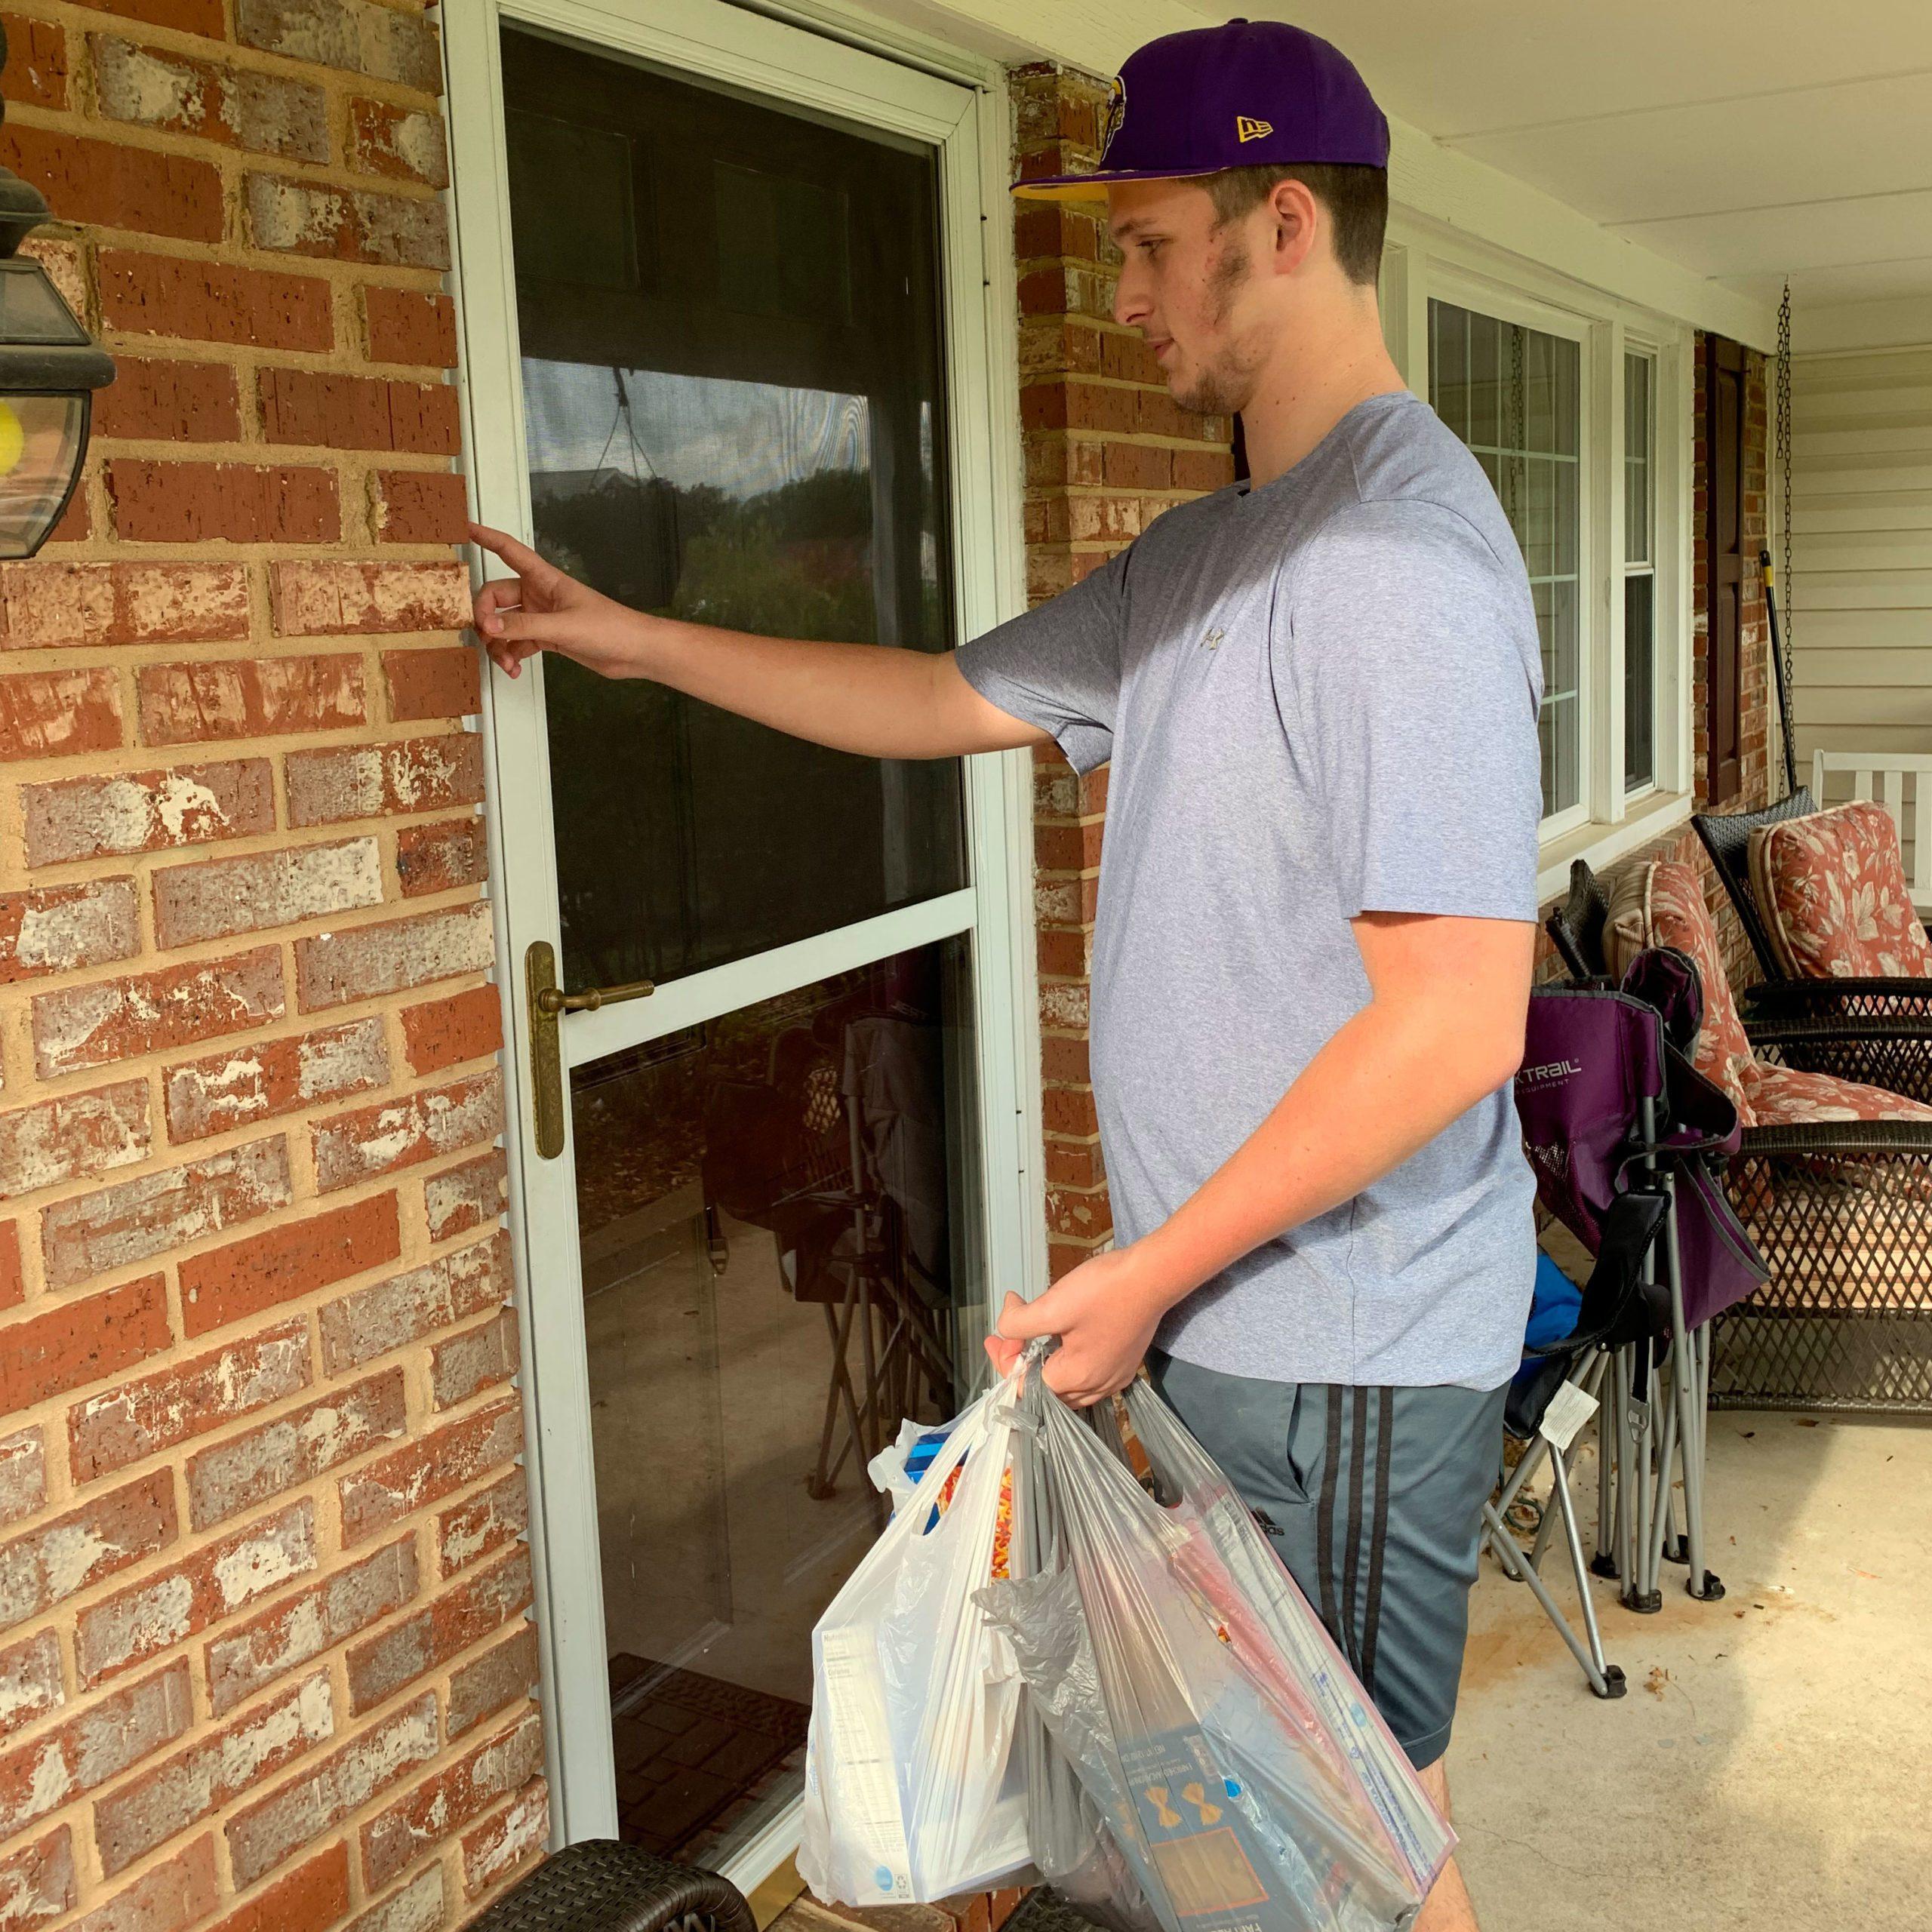 michael owens delivering groceries